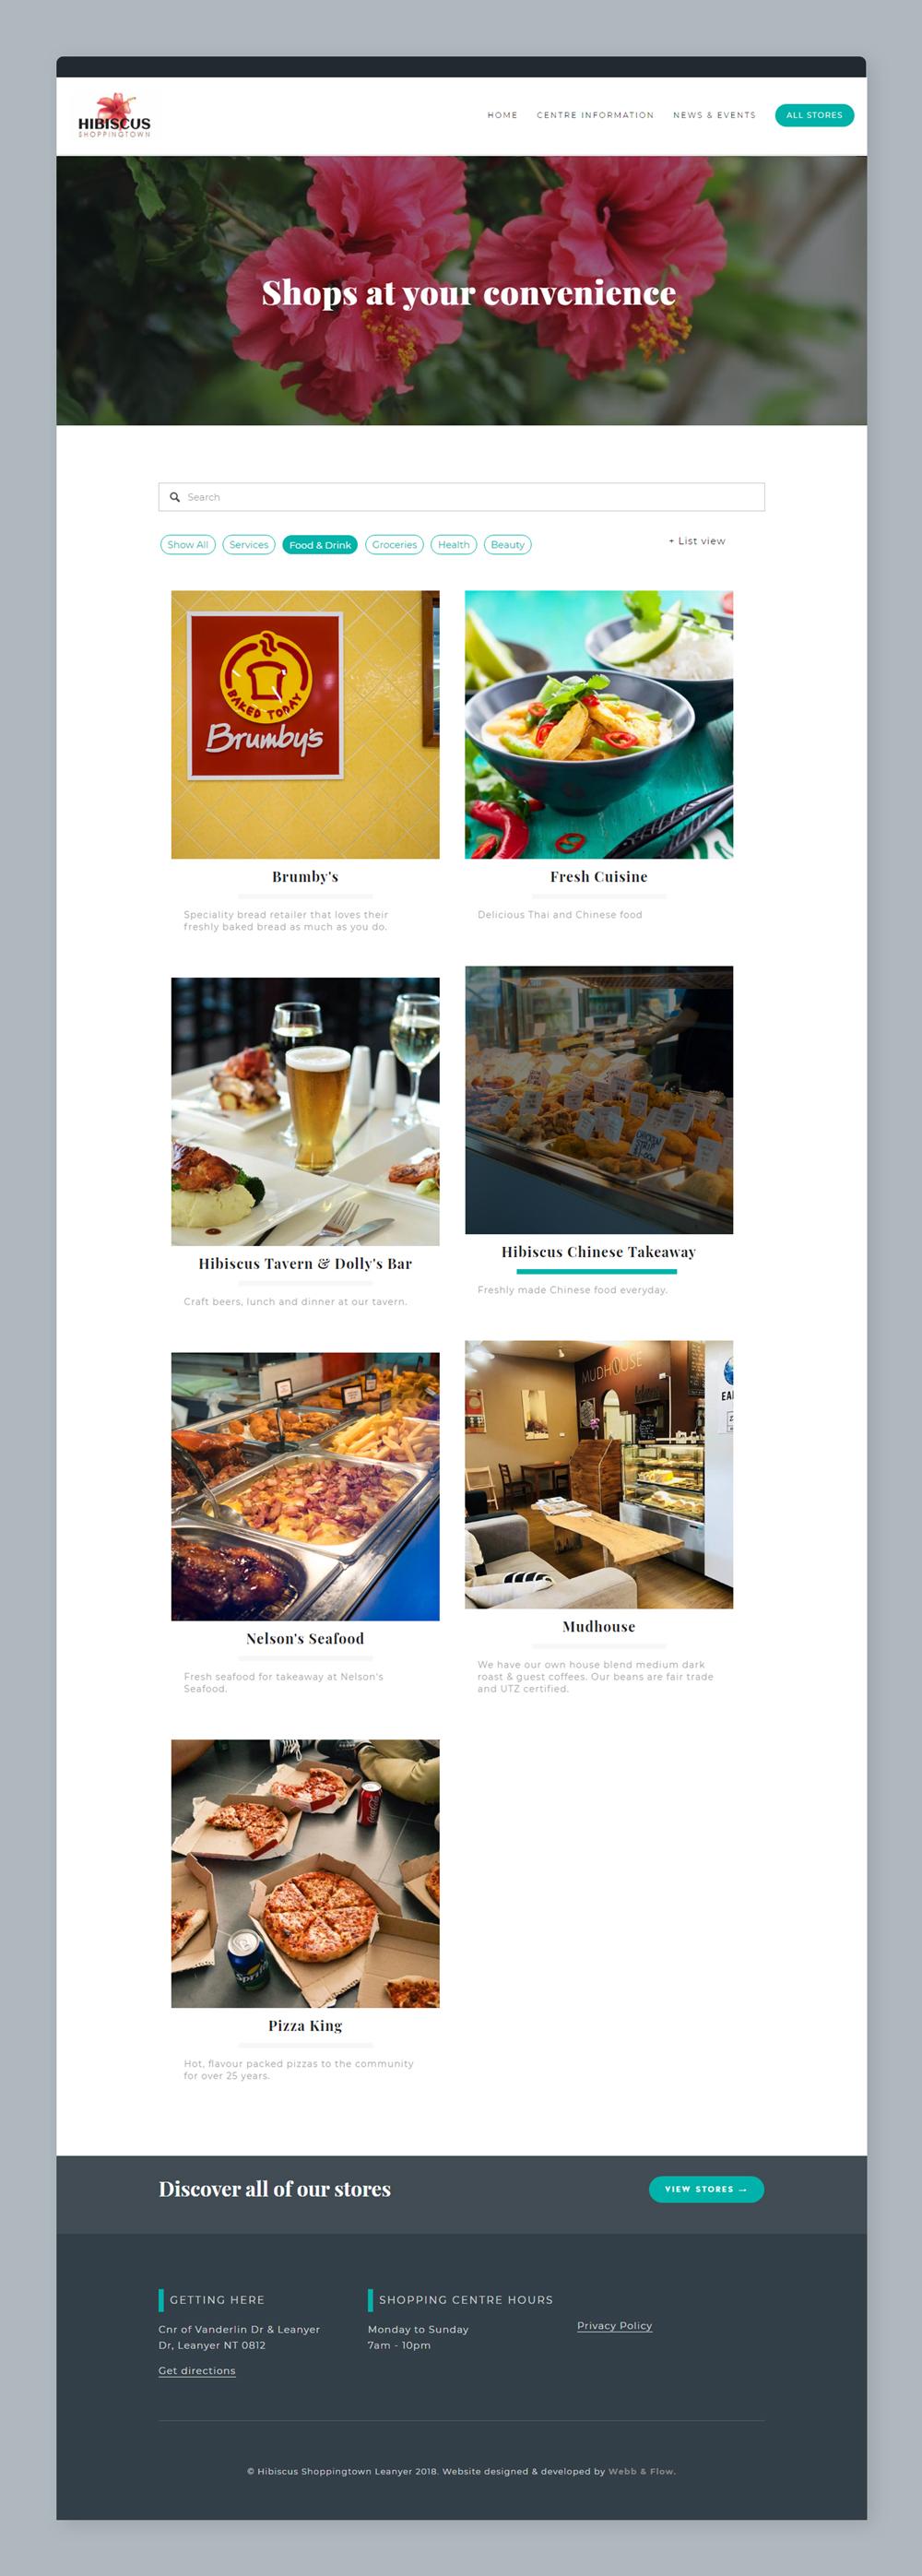 WebbFlow-portfolio-browser-hibiscus4.jpg